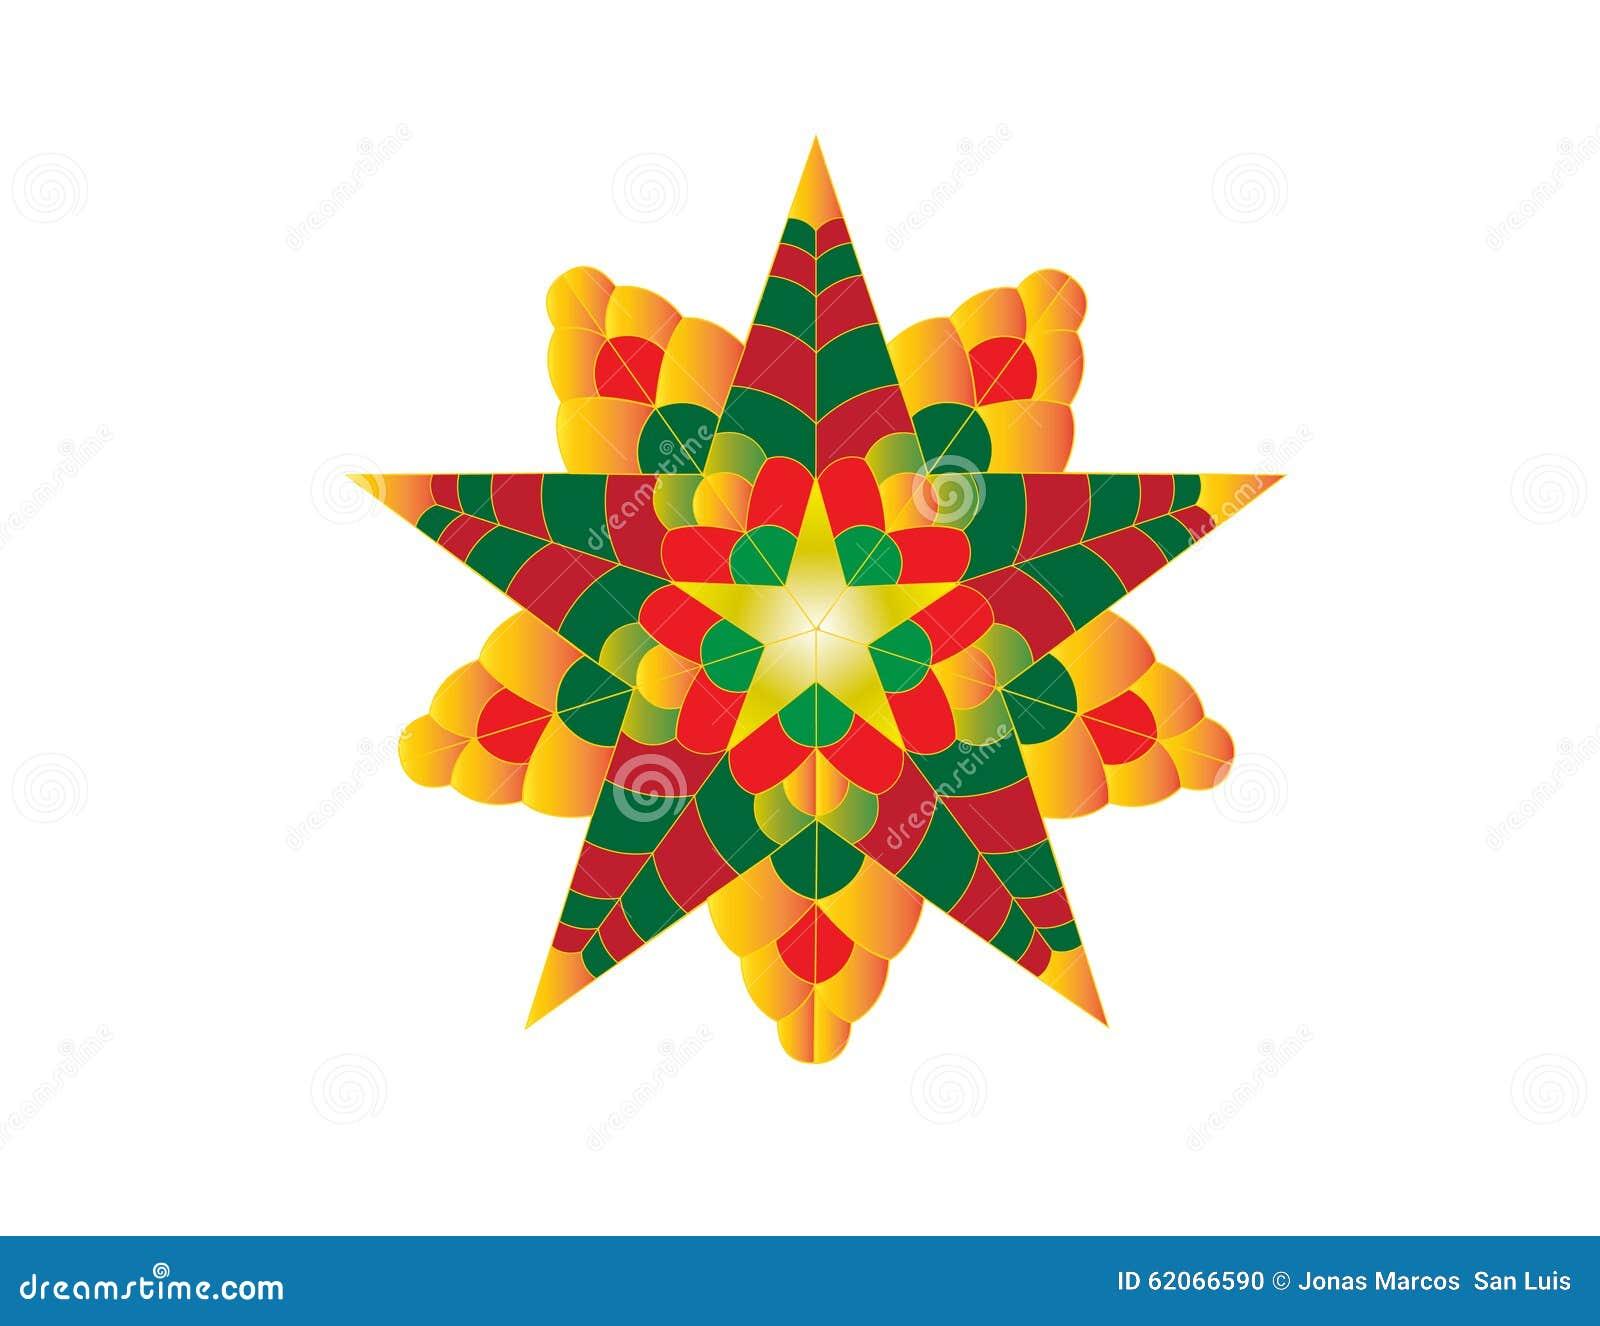 Christmas Lantern.Colourful Christmas Lantern Stock Vector Illustration Of